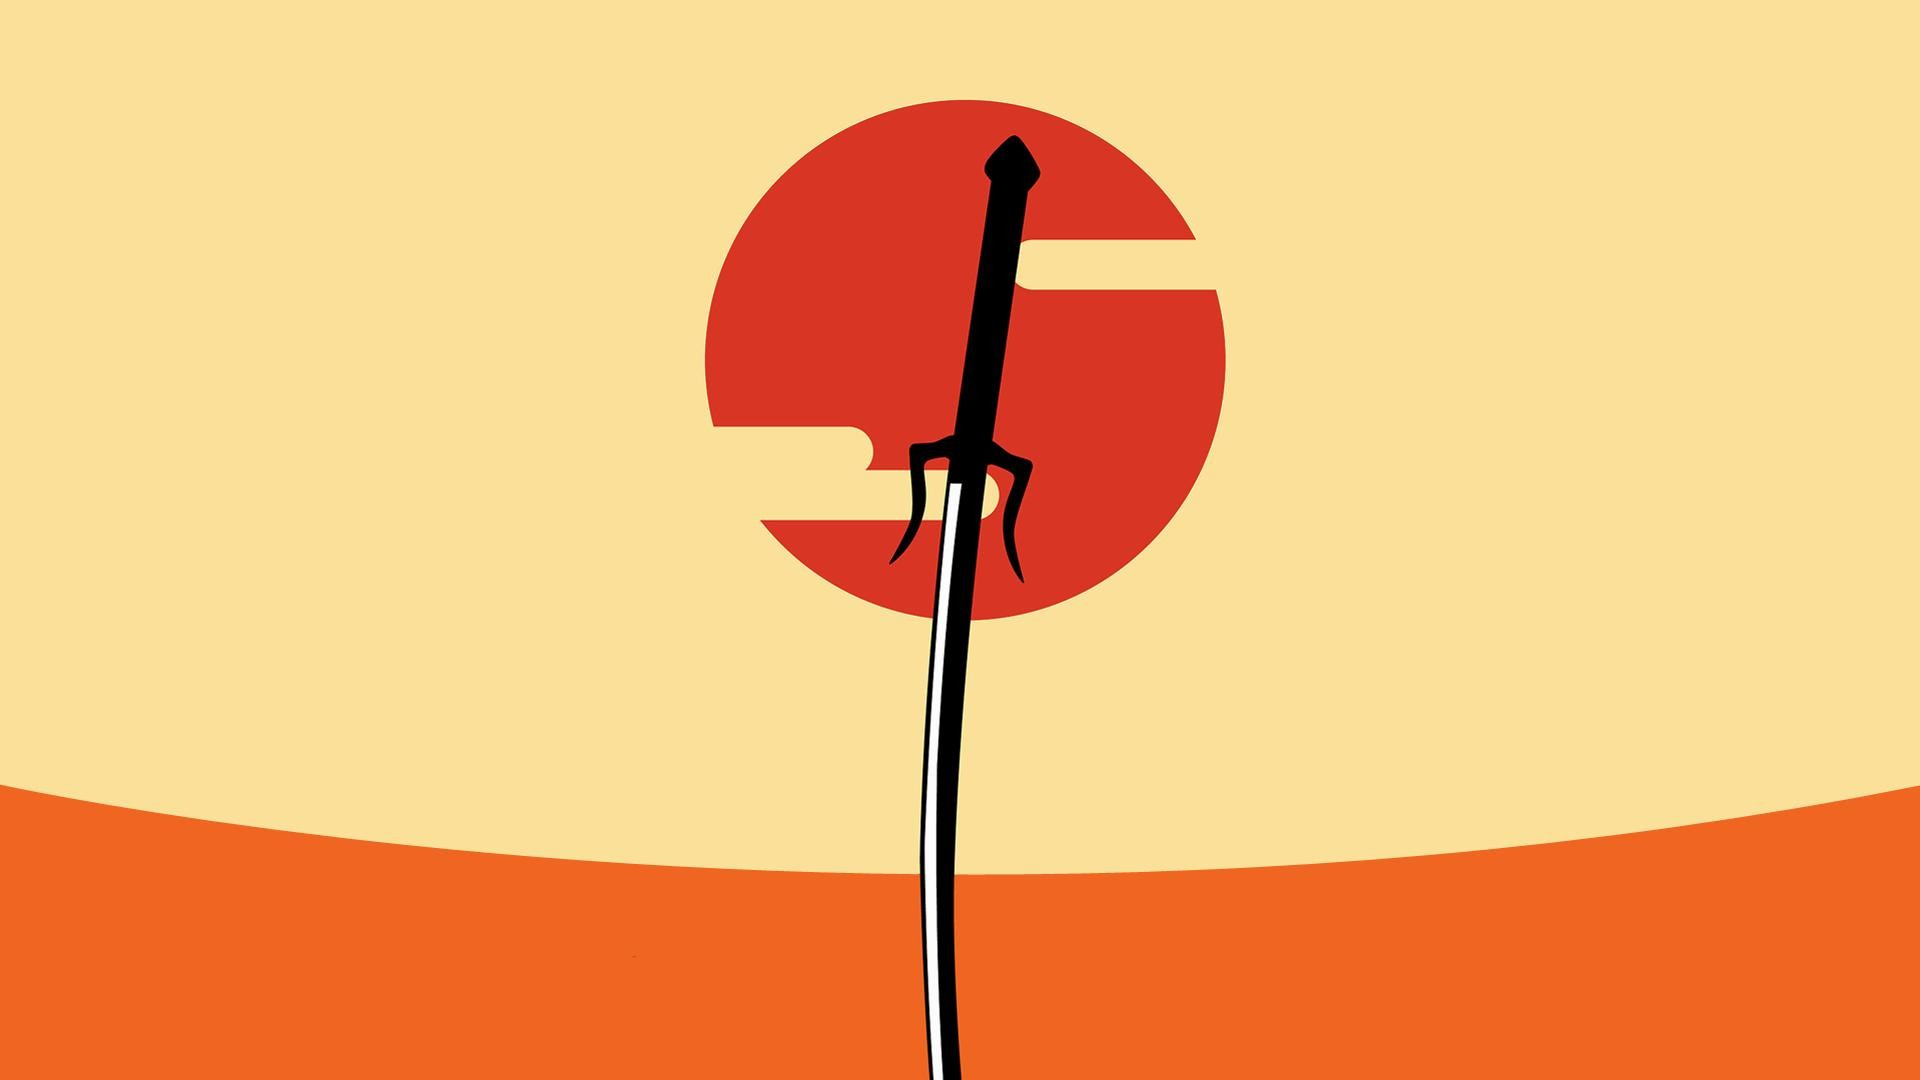 wallpaper.wiki-Samurai-Champloo-Picture-HD-PIC-WPE001307